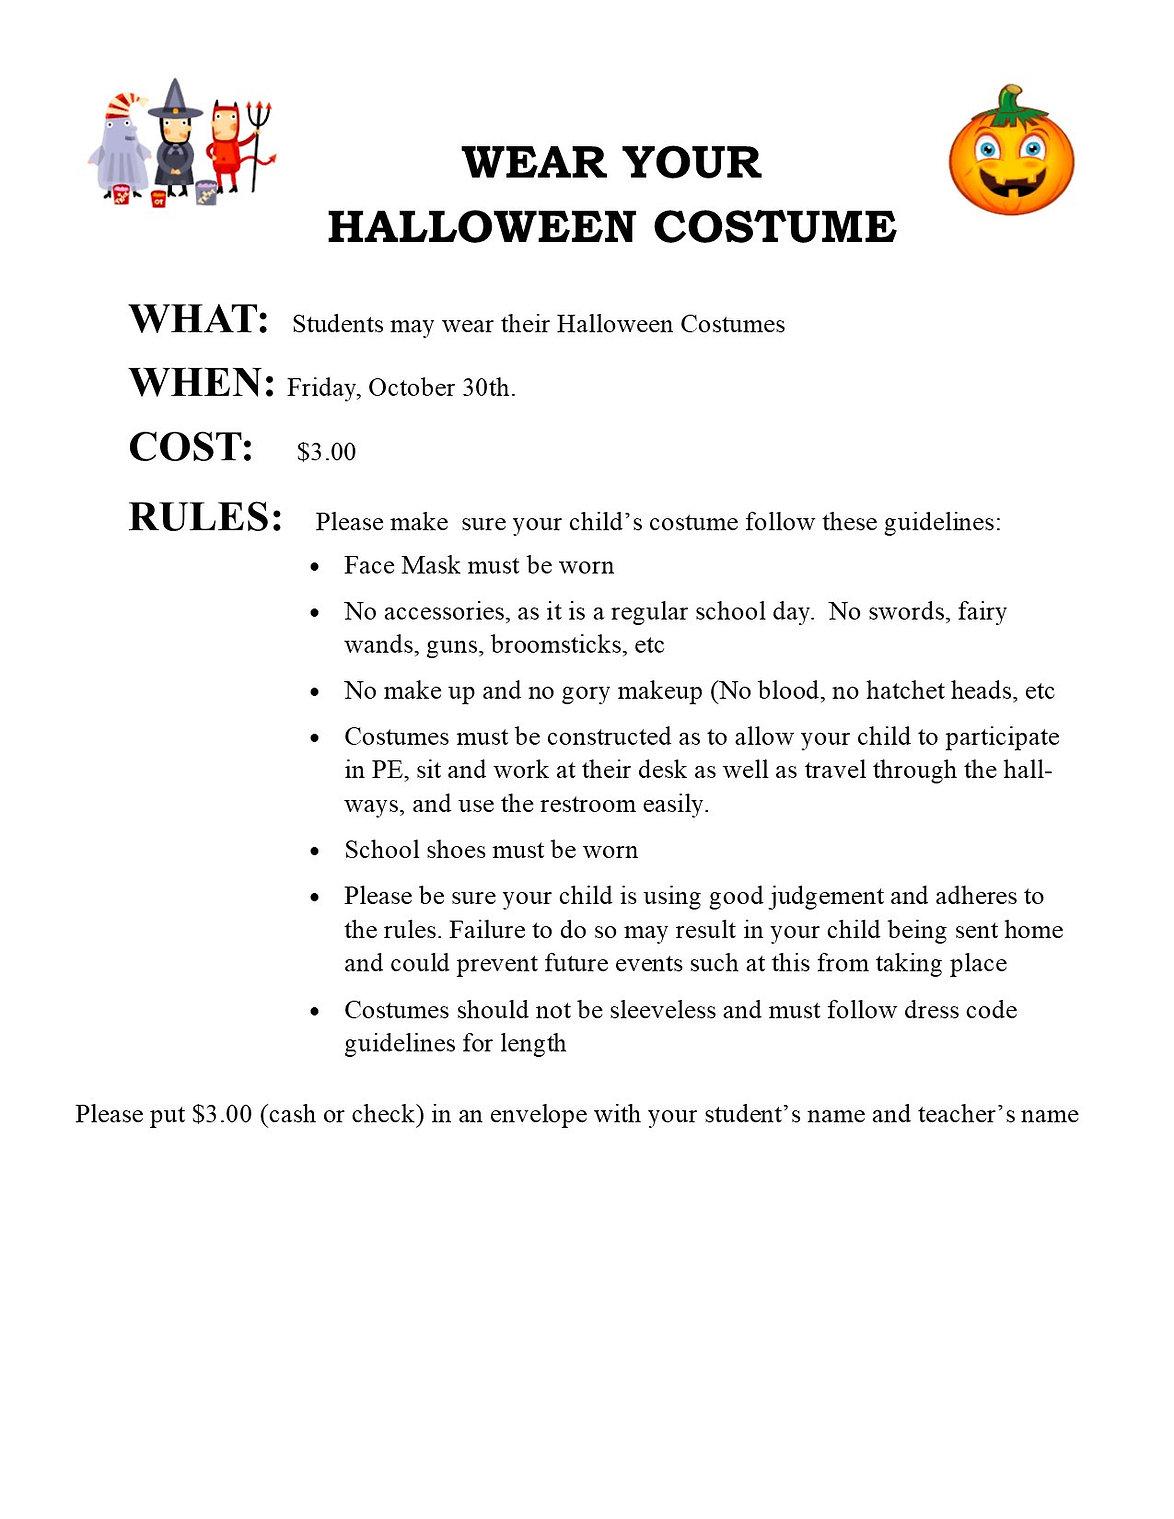 halloween costume.jpg